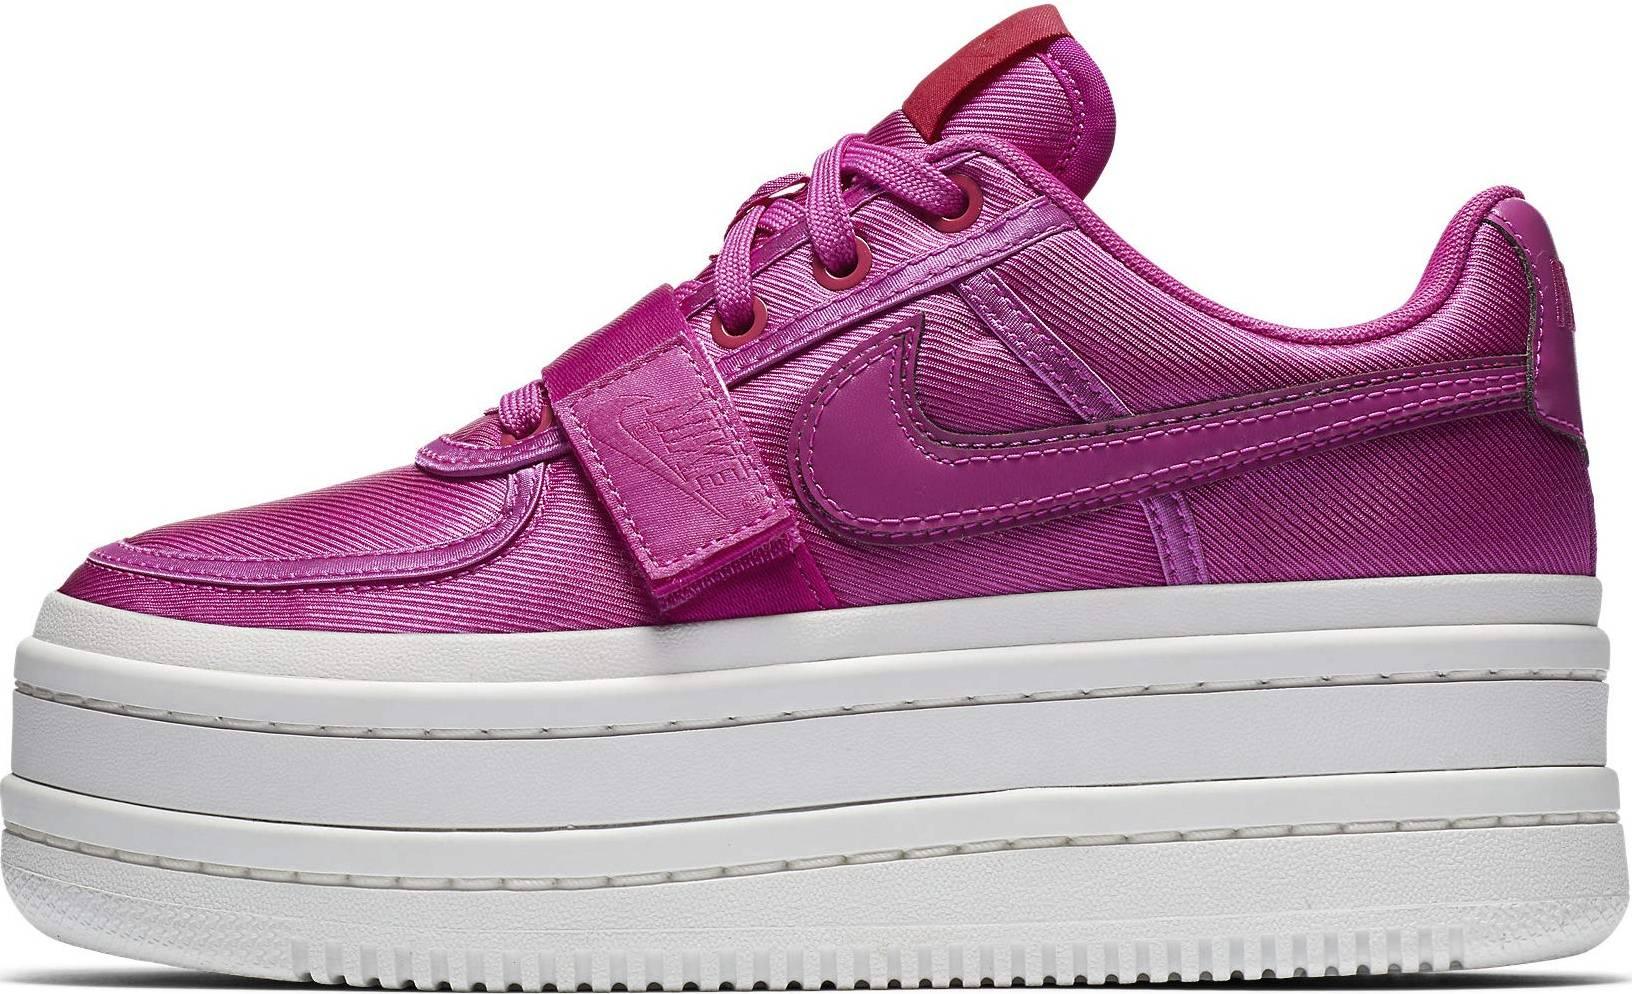 14 Reasons to/NOT to Buy Nike Vandal 2K